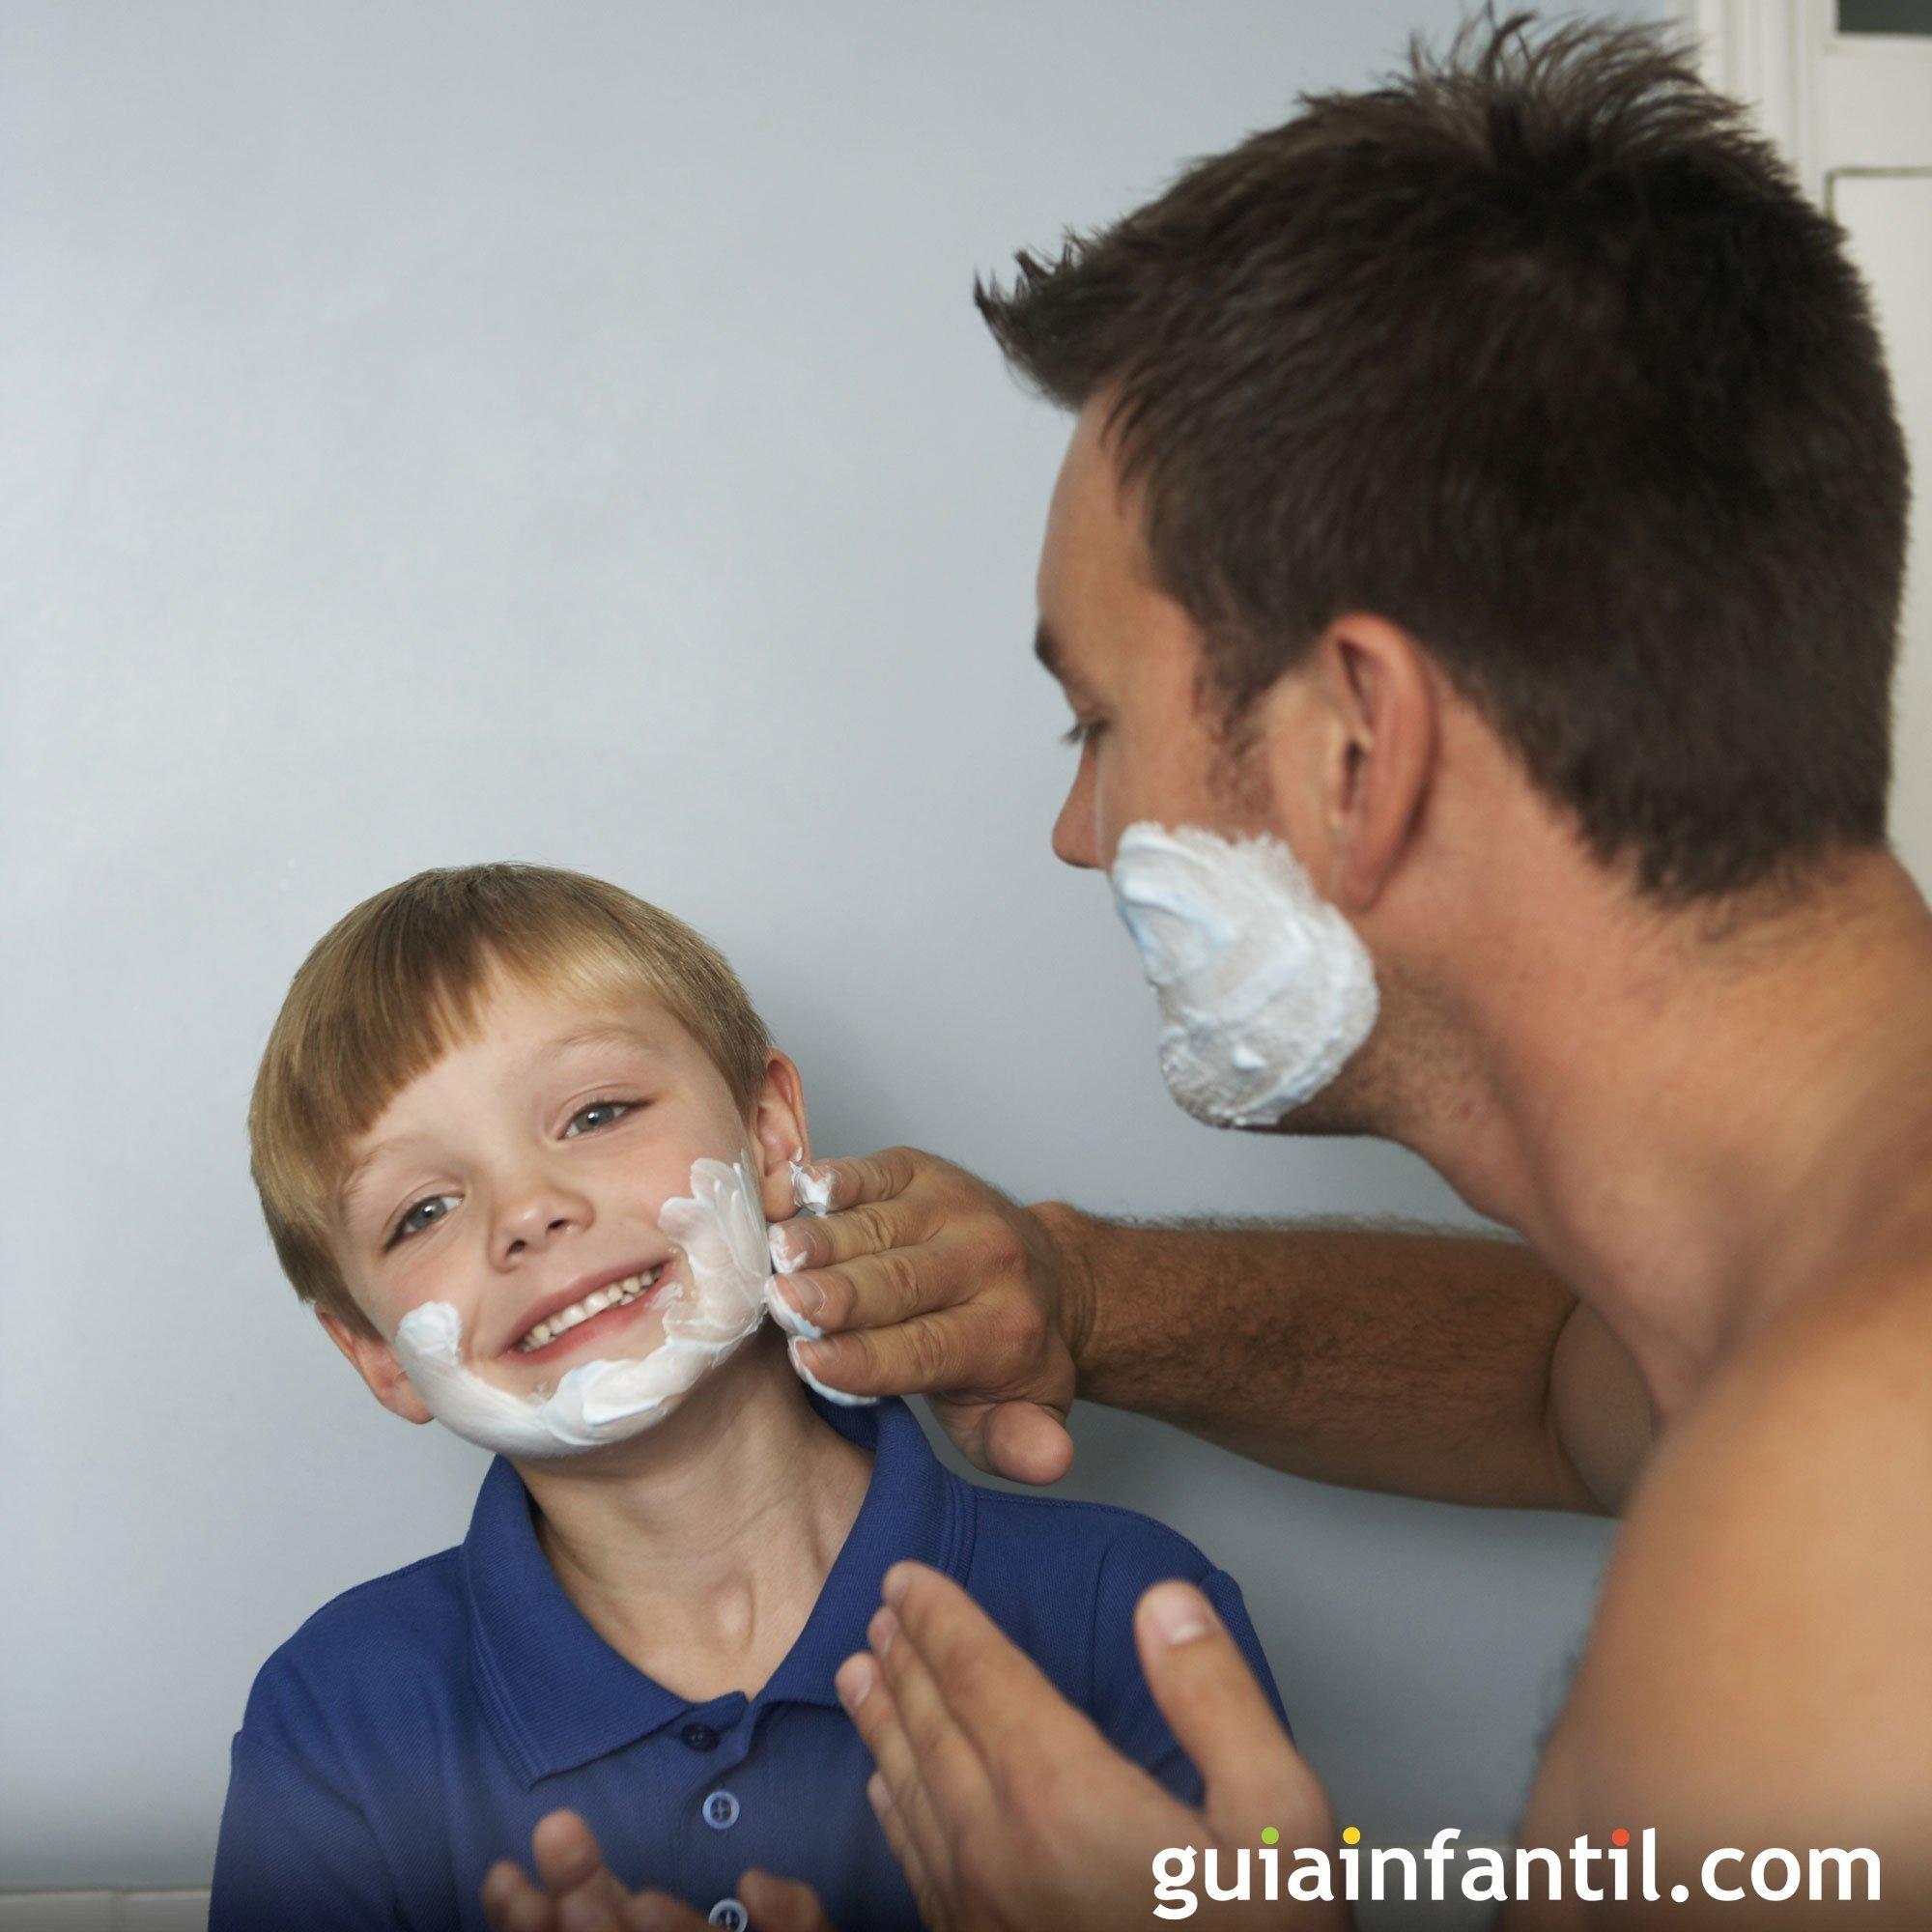 Jugando a afeitarse. Fotos divertidas con papá